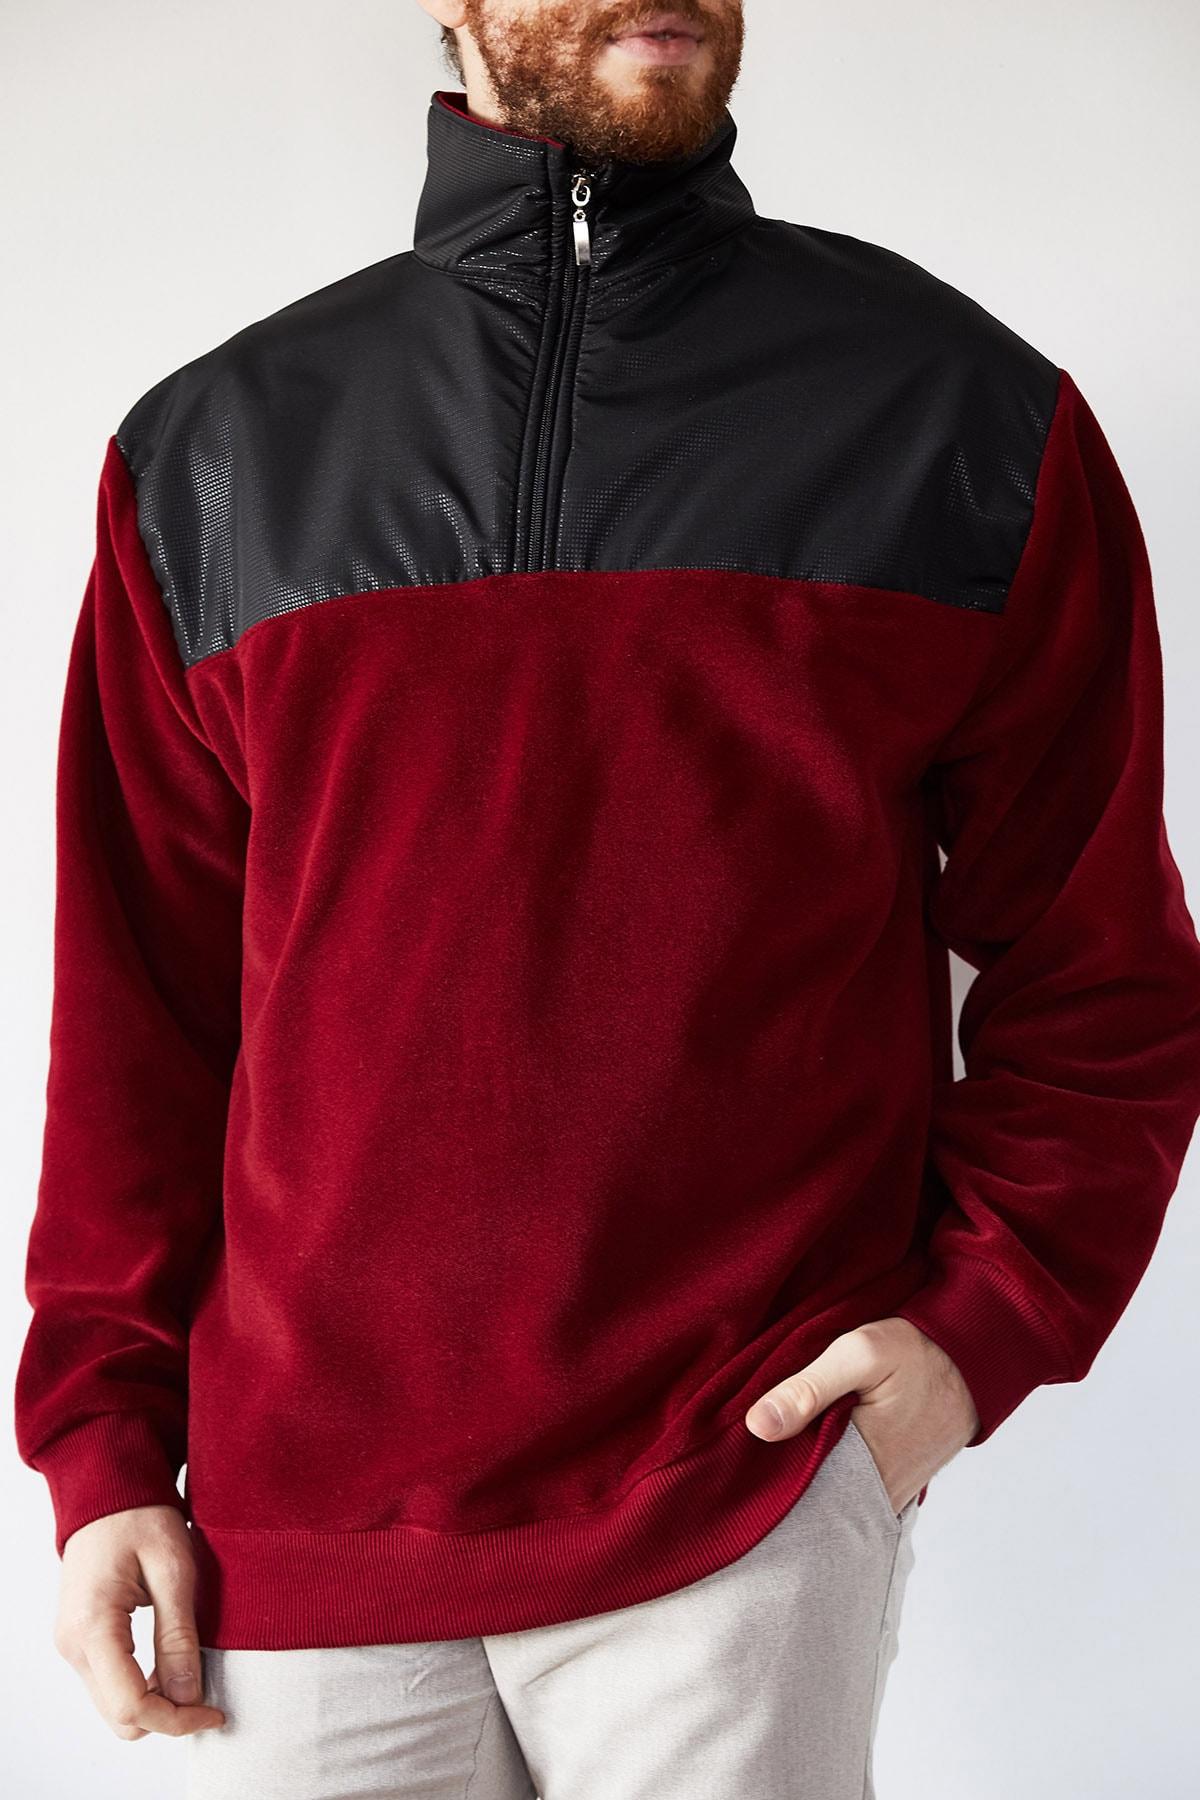 XHAN Erkek Bordo Deri Garnili Polar Sweatshirt 1kxe8-44233-05 1